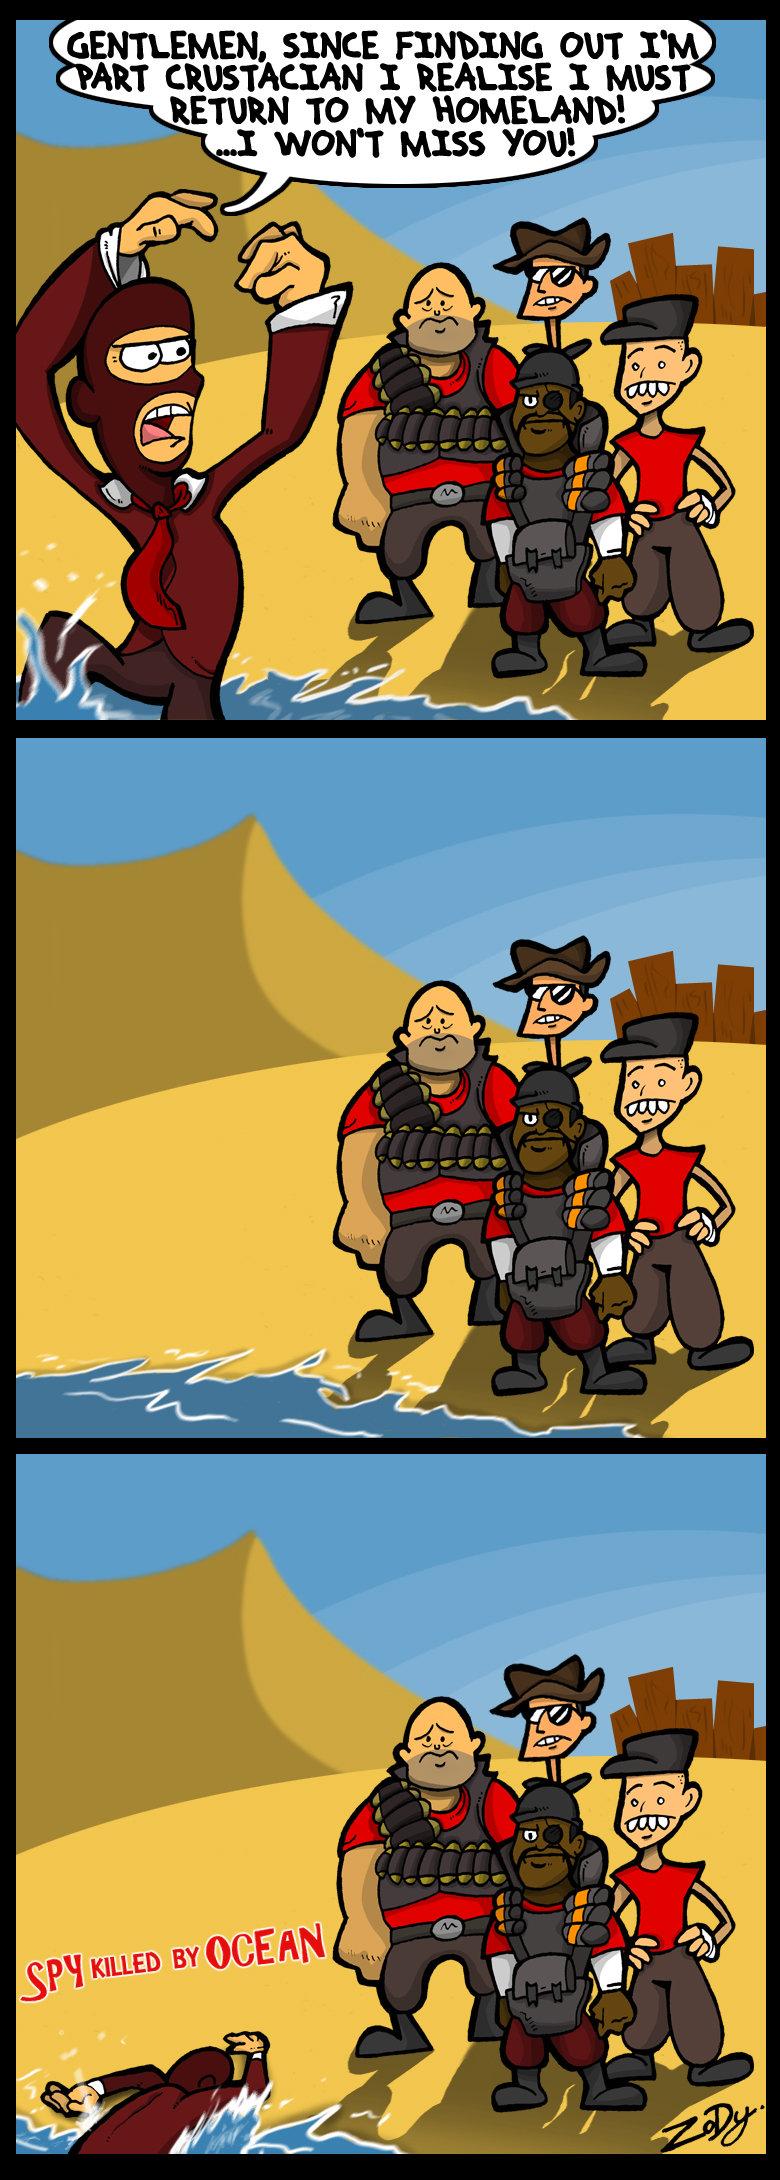 spy crabs. why do people kill spy crabs? WHY?!?!?. Mill, SINCE can iih' Llil. y.... i! i! Ericii MISS YOU! all %. so sad